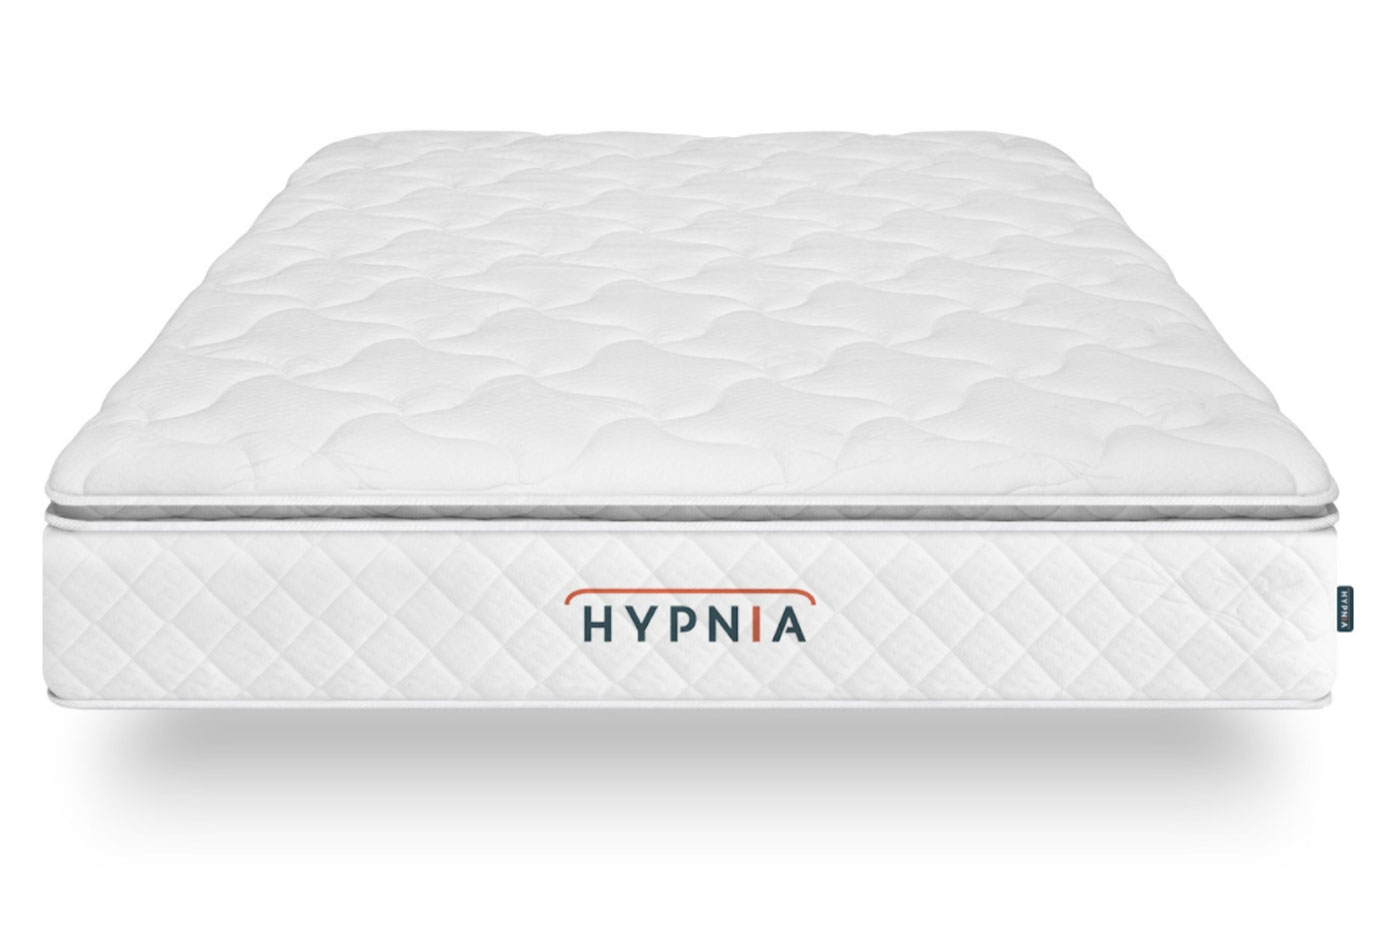 Hypnia Bien-être Suprême